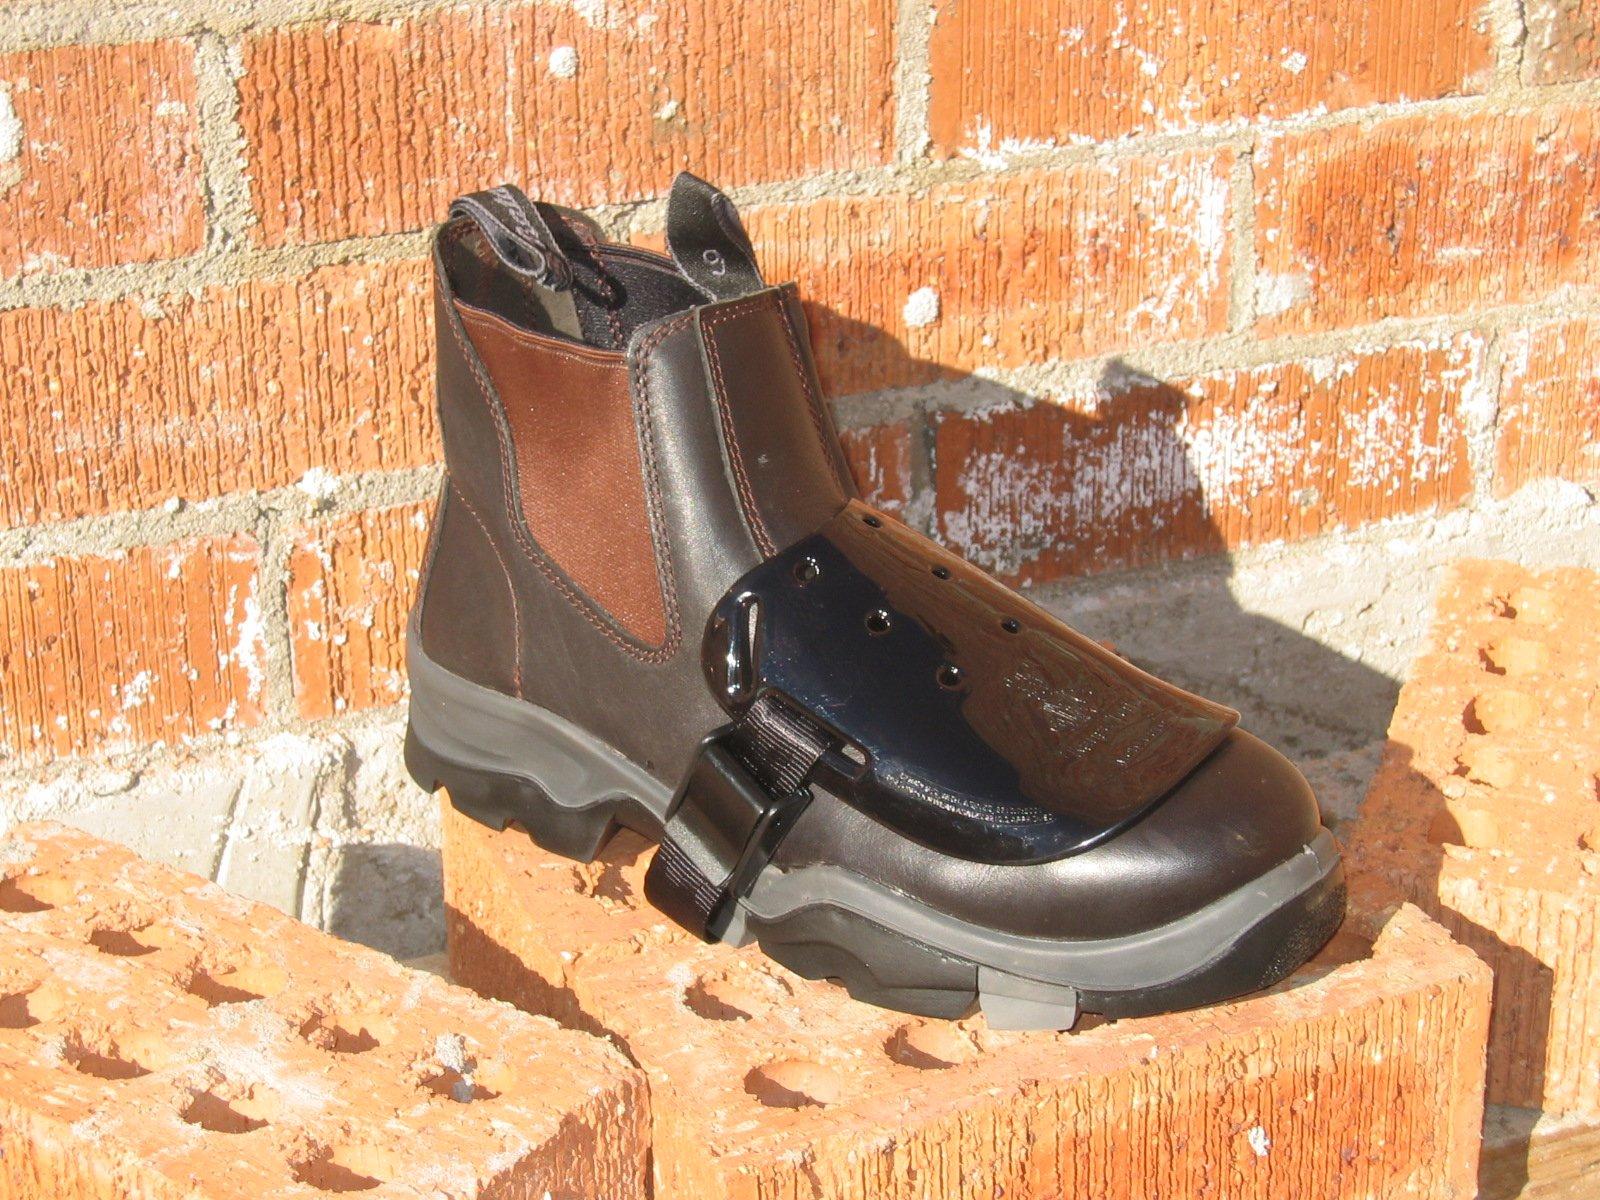 Impacto Kanga Tuff Metguard Safety Footwear Metatarsal Protection Attachment - 20pairs (1 Case) By Sena Safety